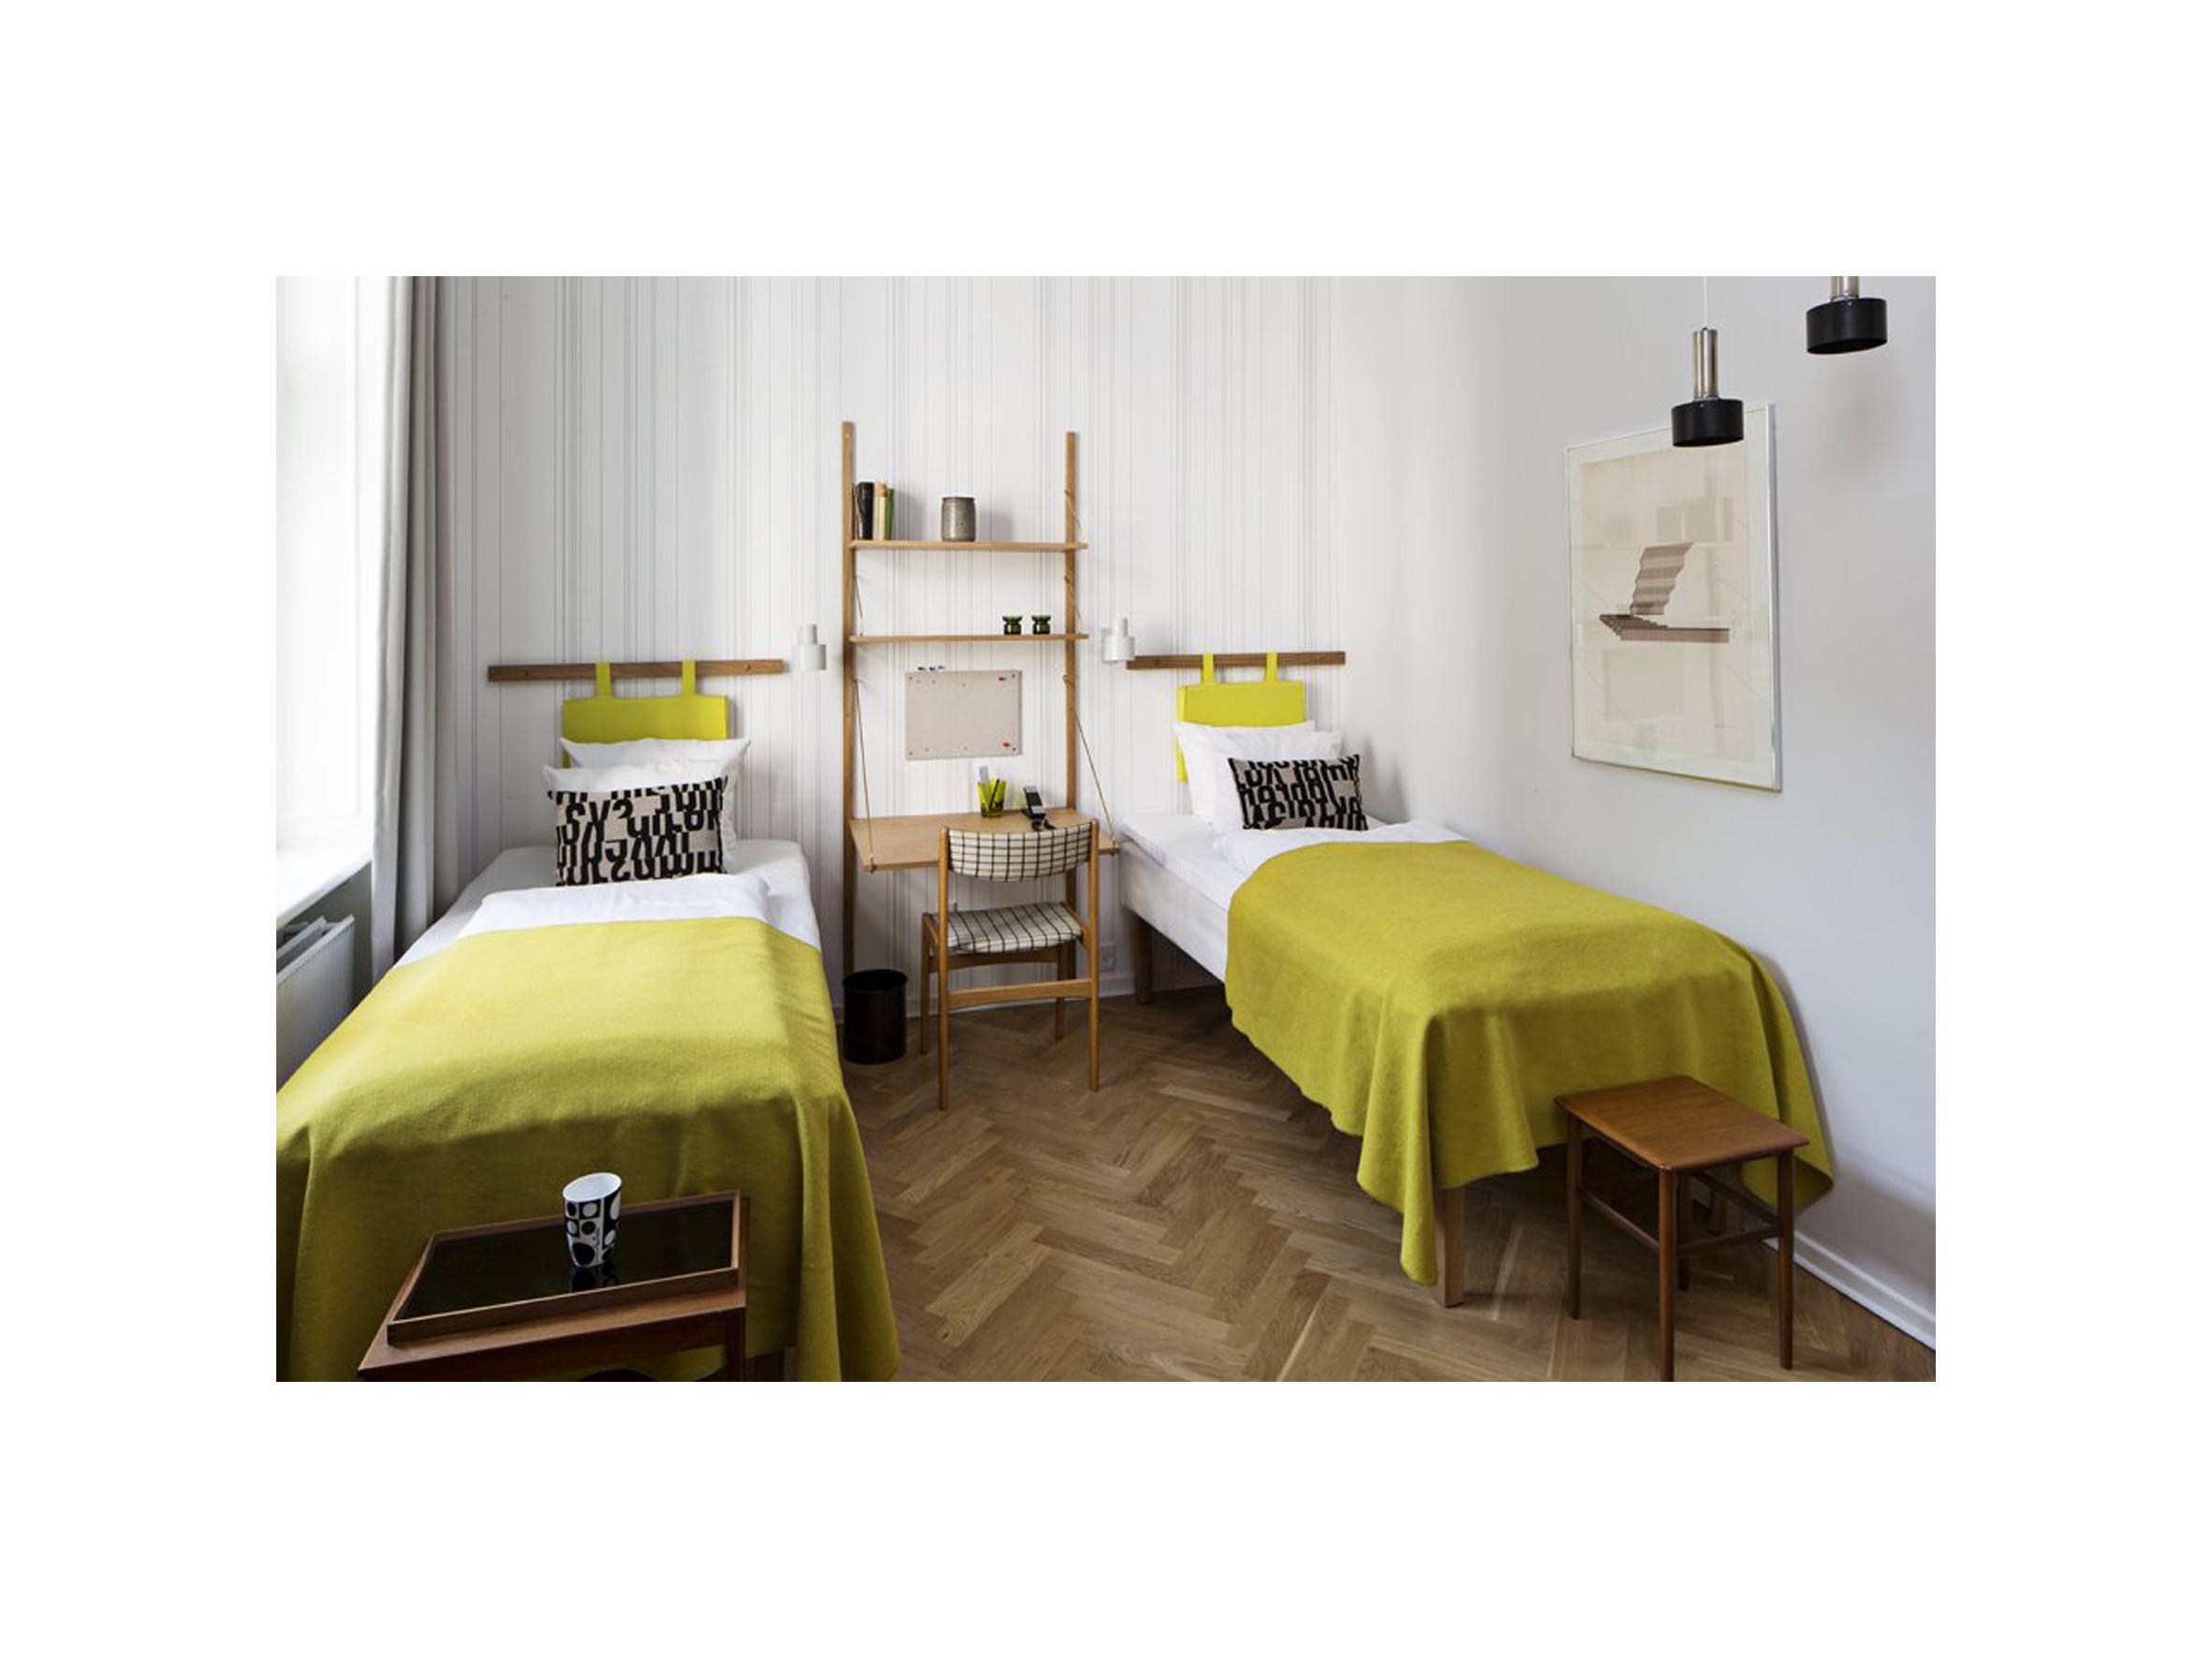 retro-twin-room-60s.jpg